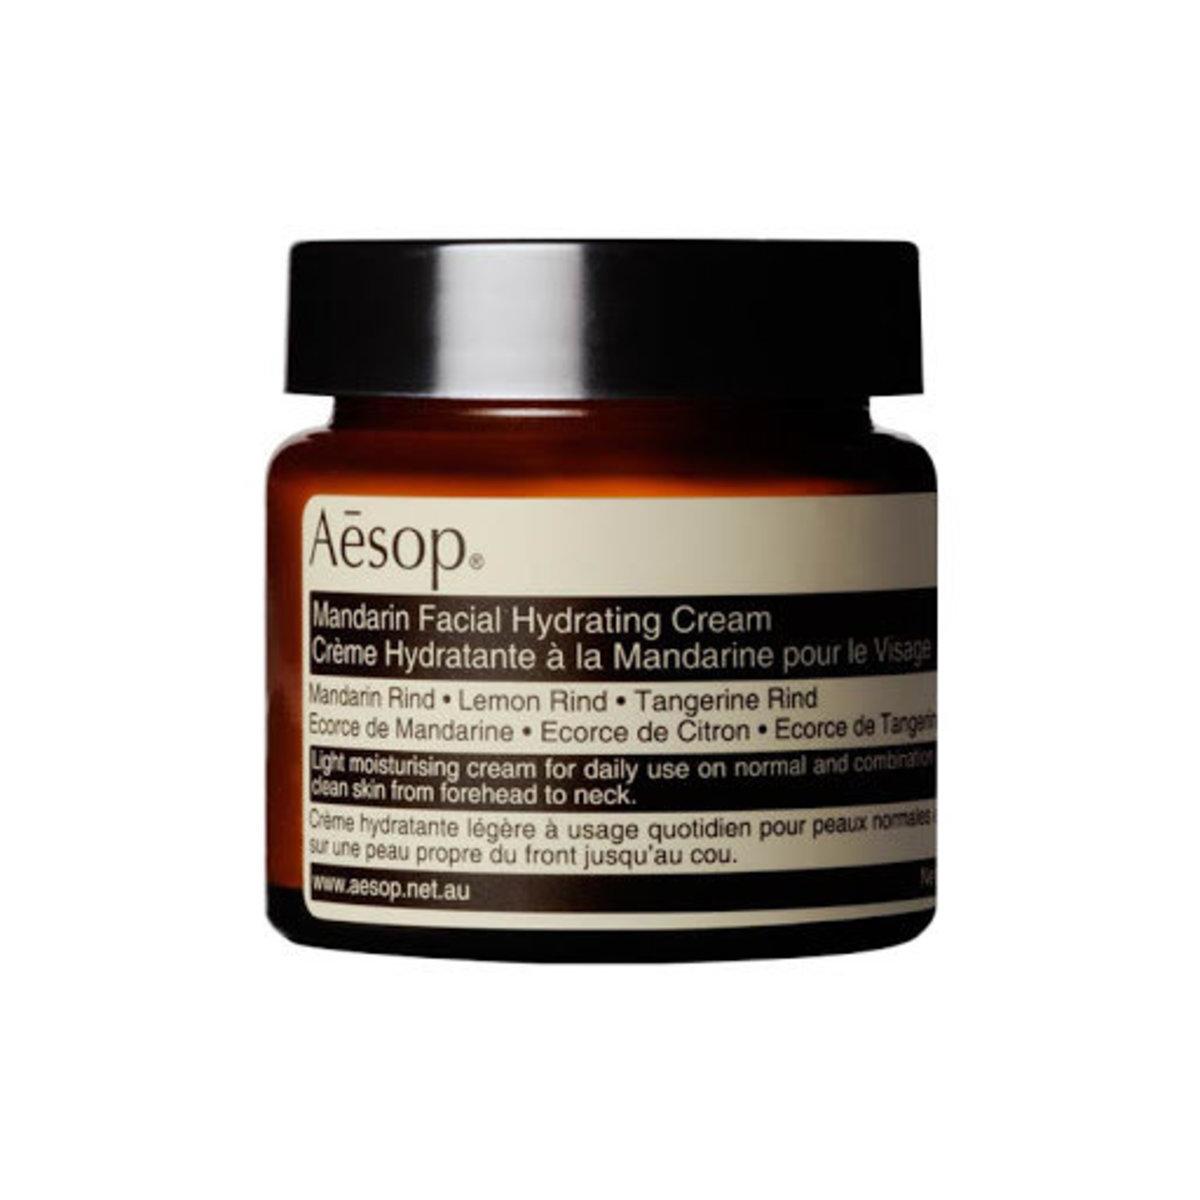 Mandarin Facial Hydrating Cream 60ml (Parallel Import)